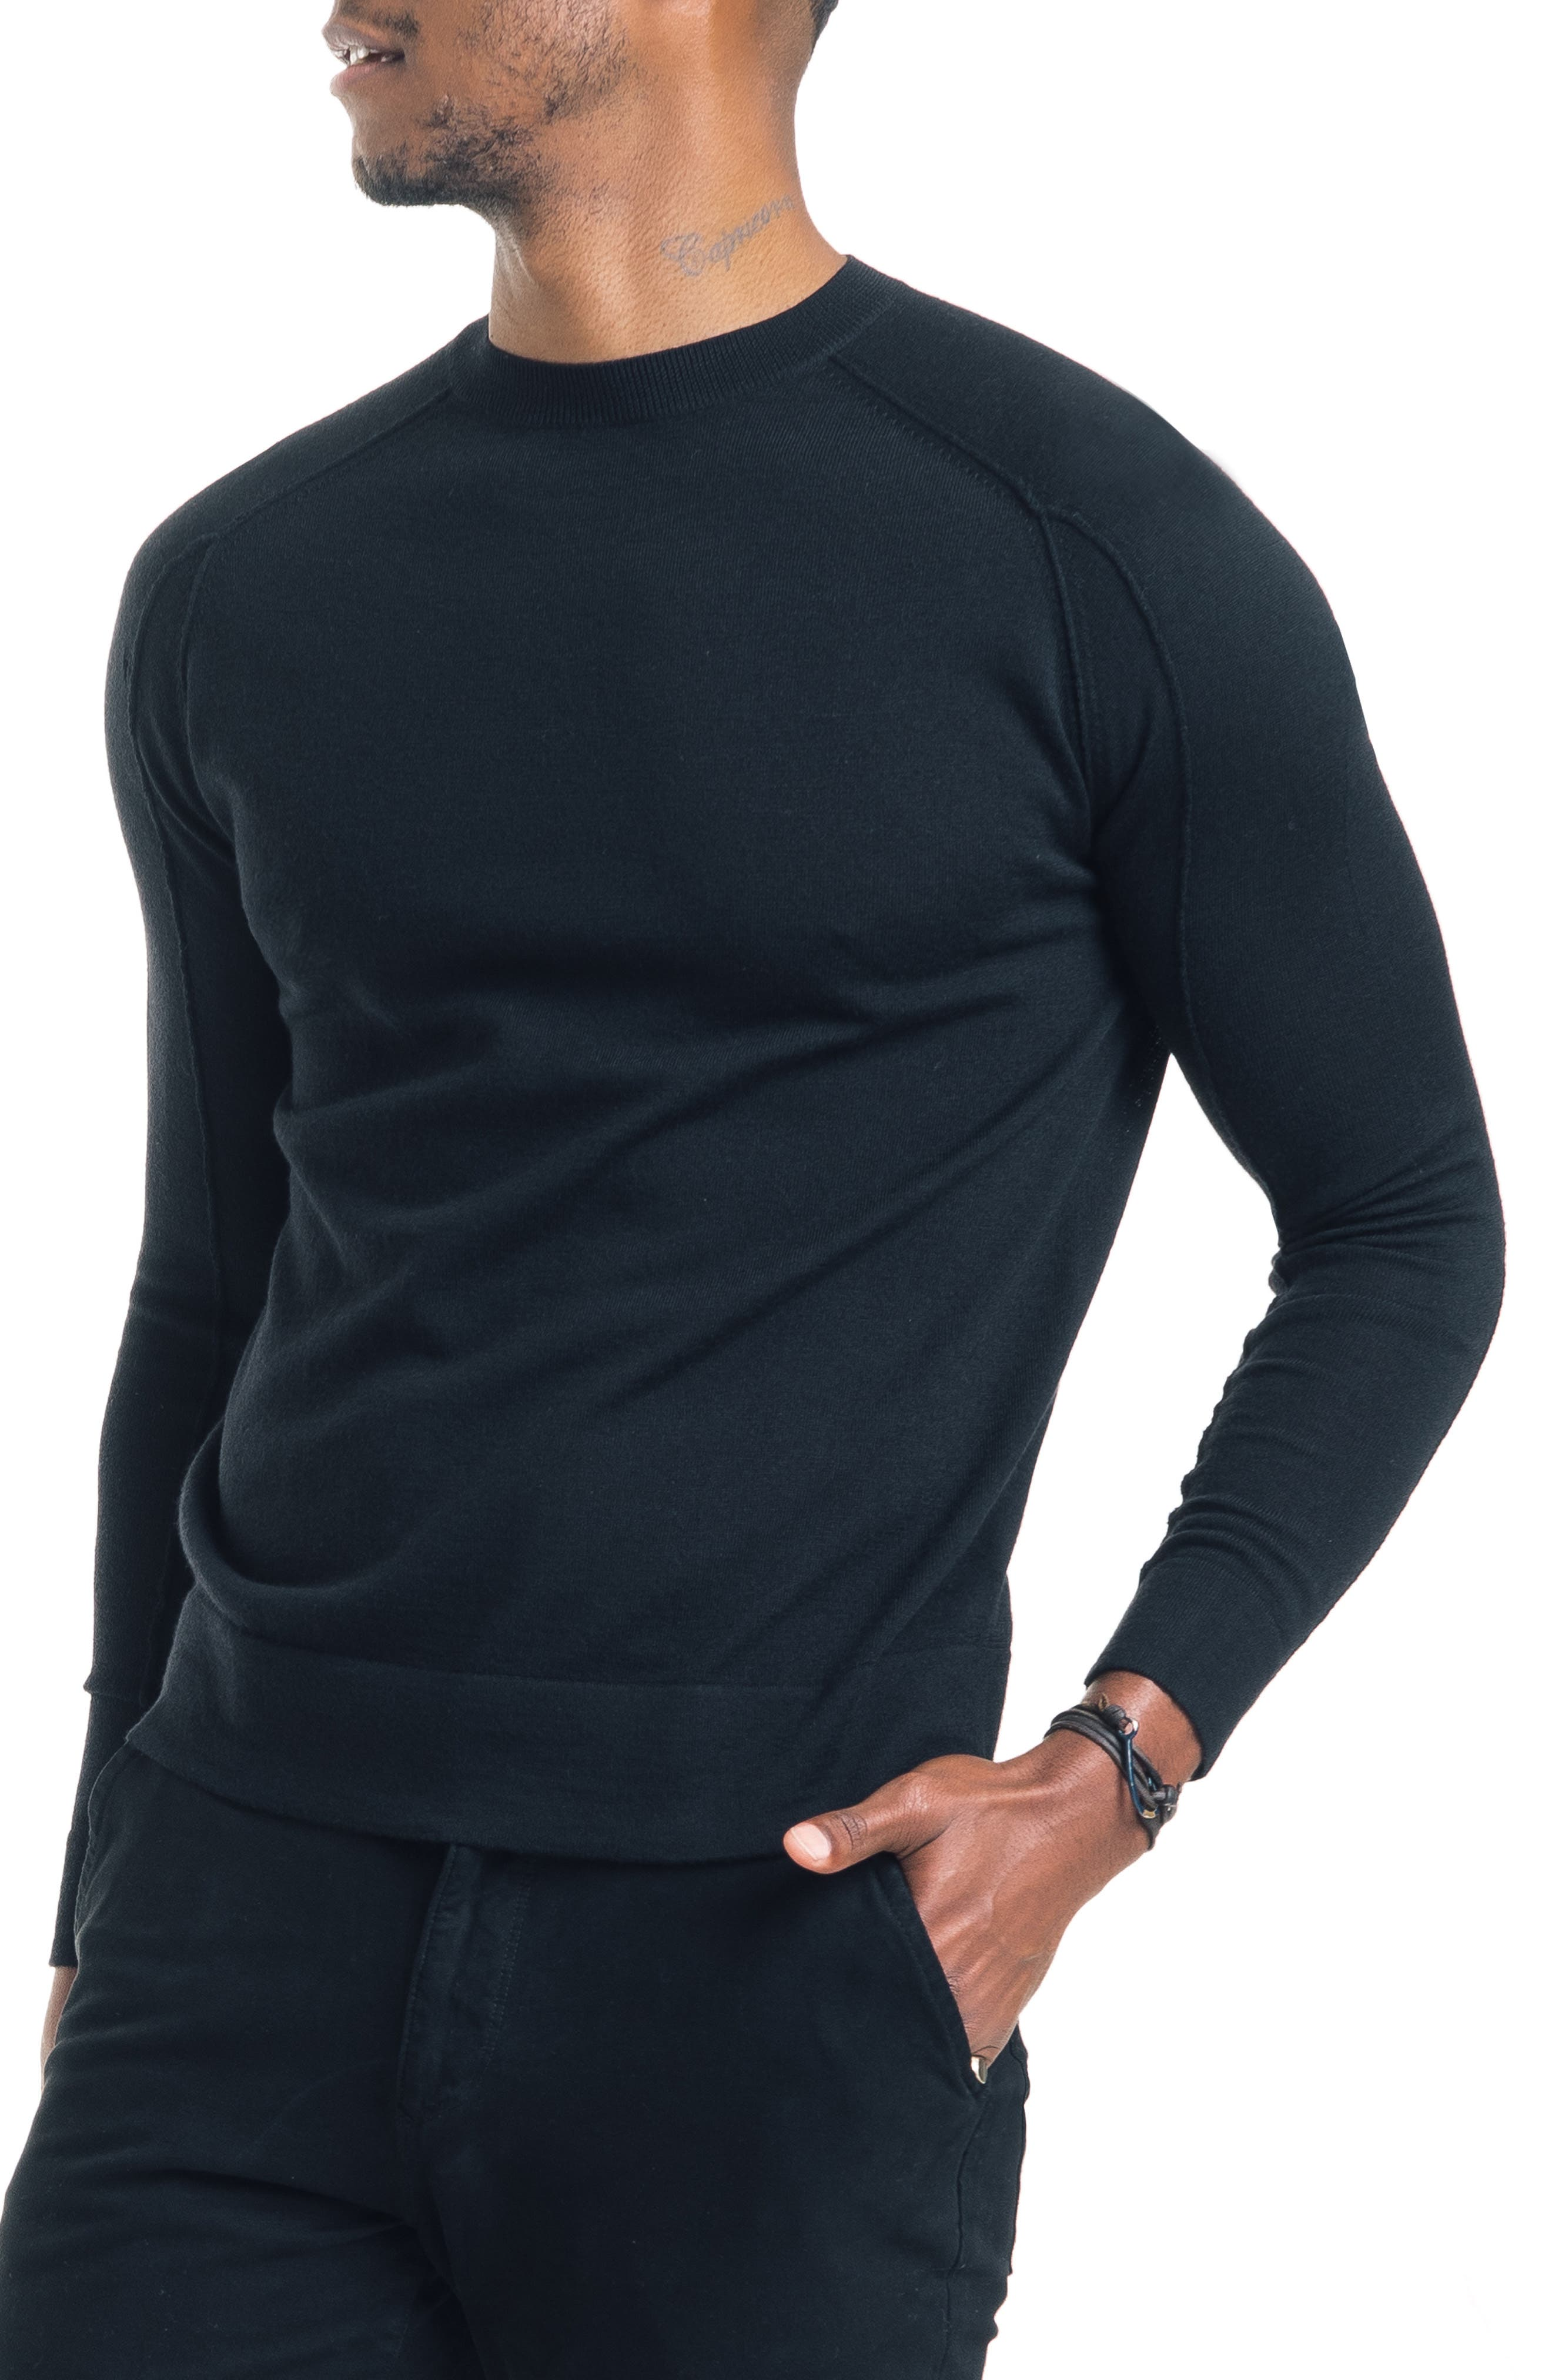 Good Man Brand Modern Slim Fit Merino Wool Sweater, Black